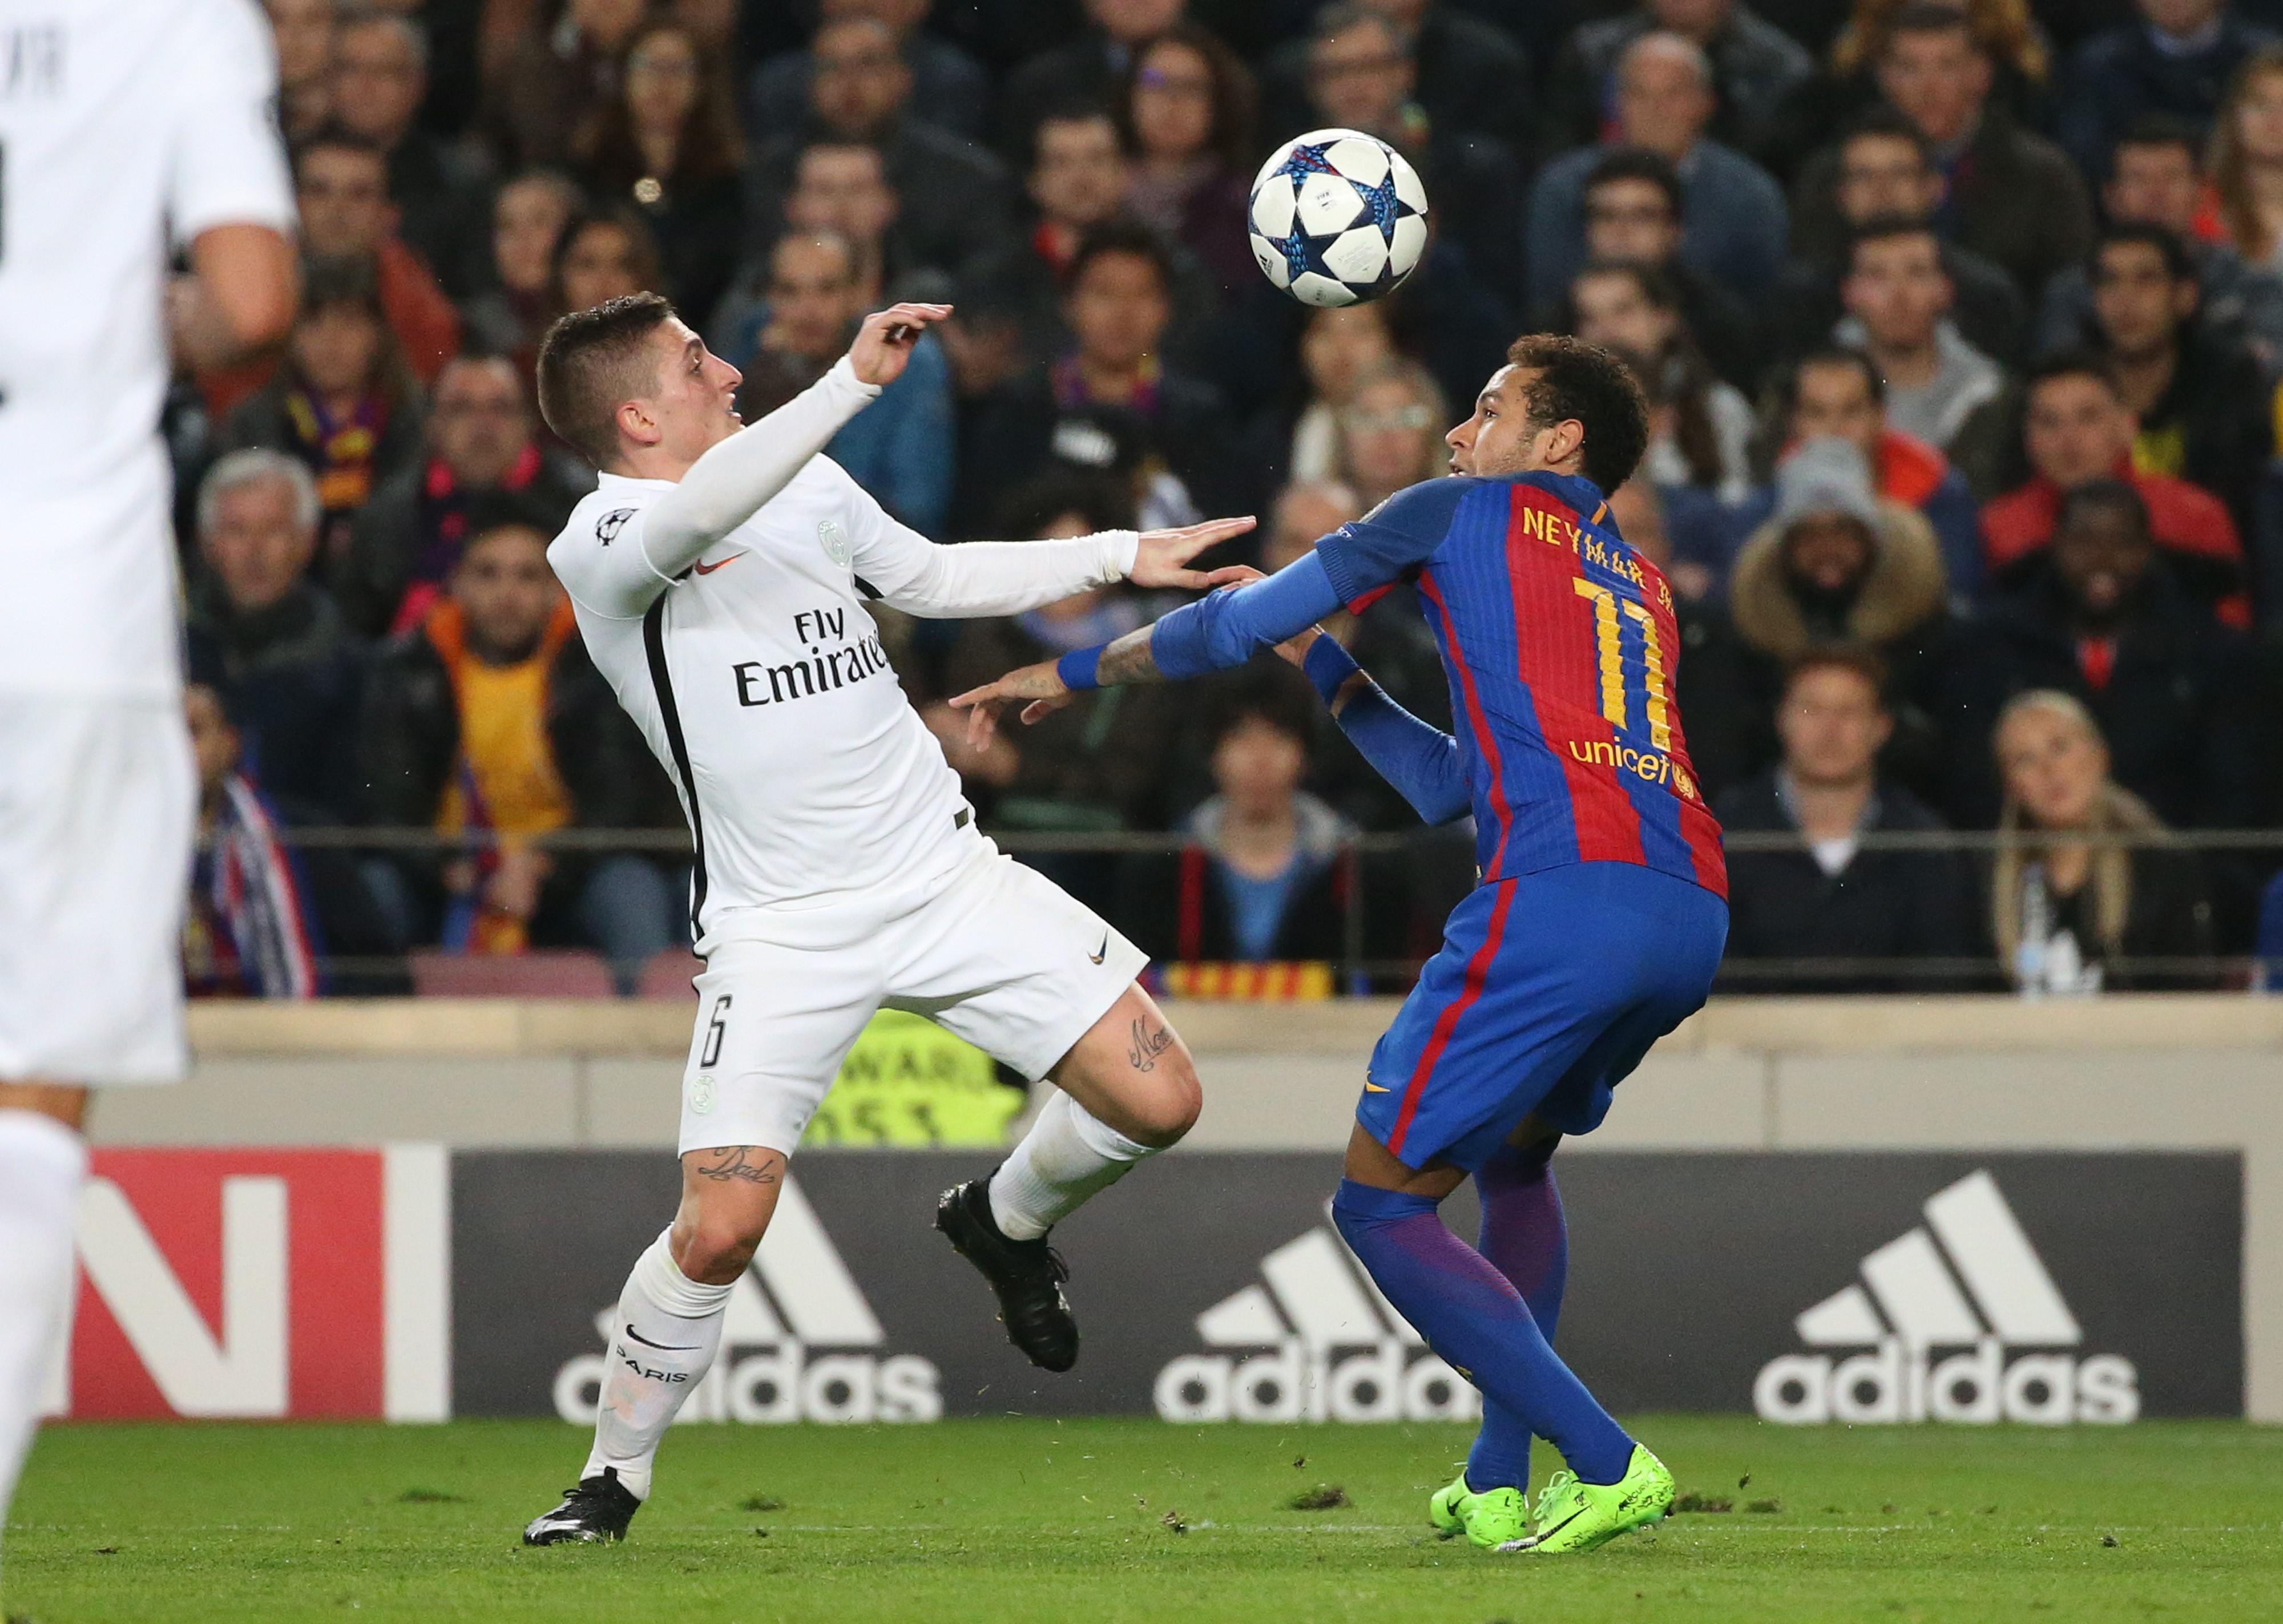 Marco Verratti (PSG) et Neymar (FC Barcelone)